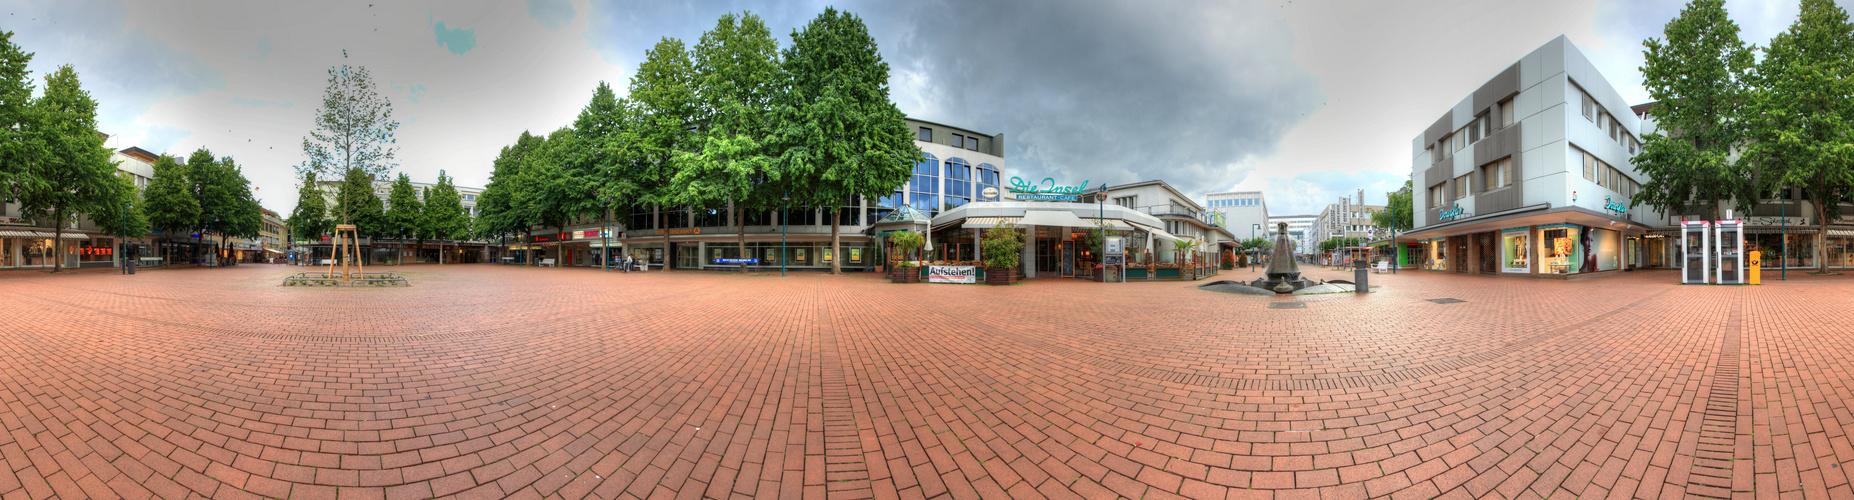 Theaterplatz in Bad Godesberg